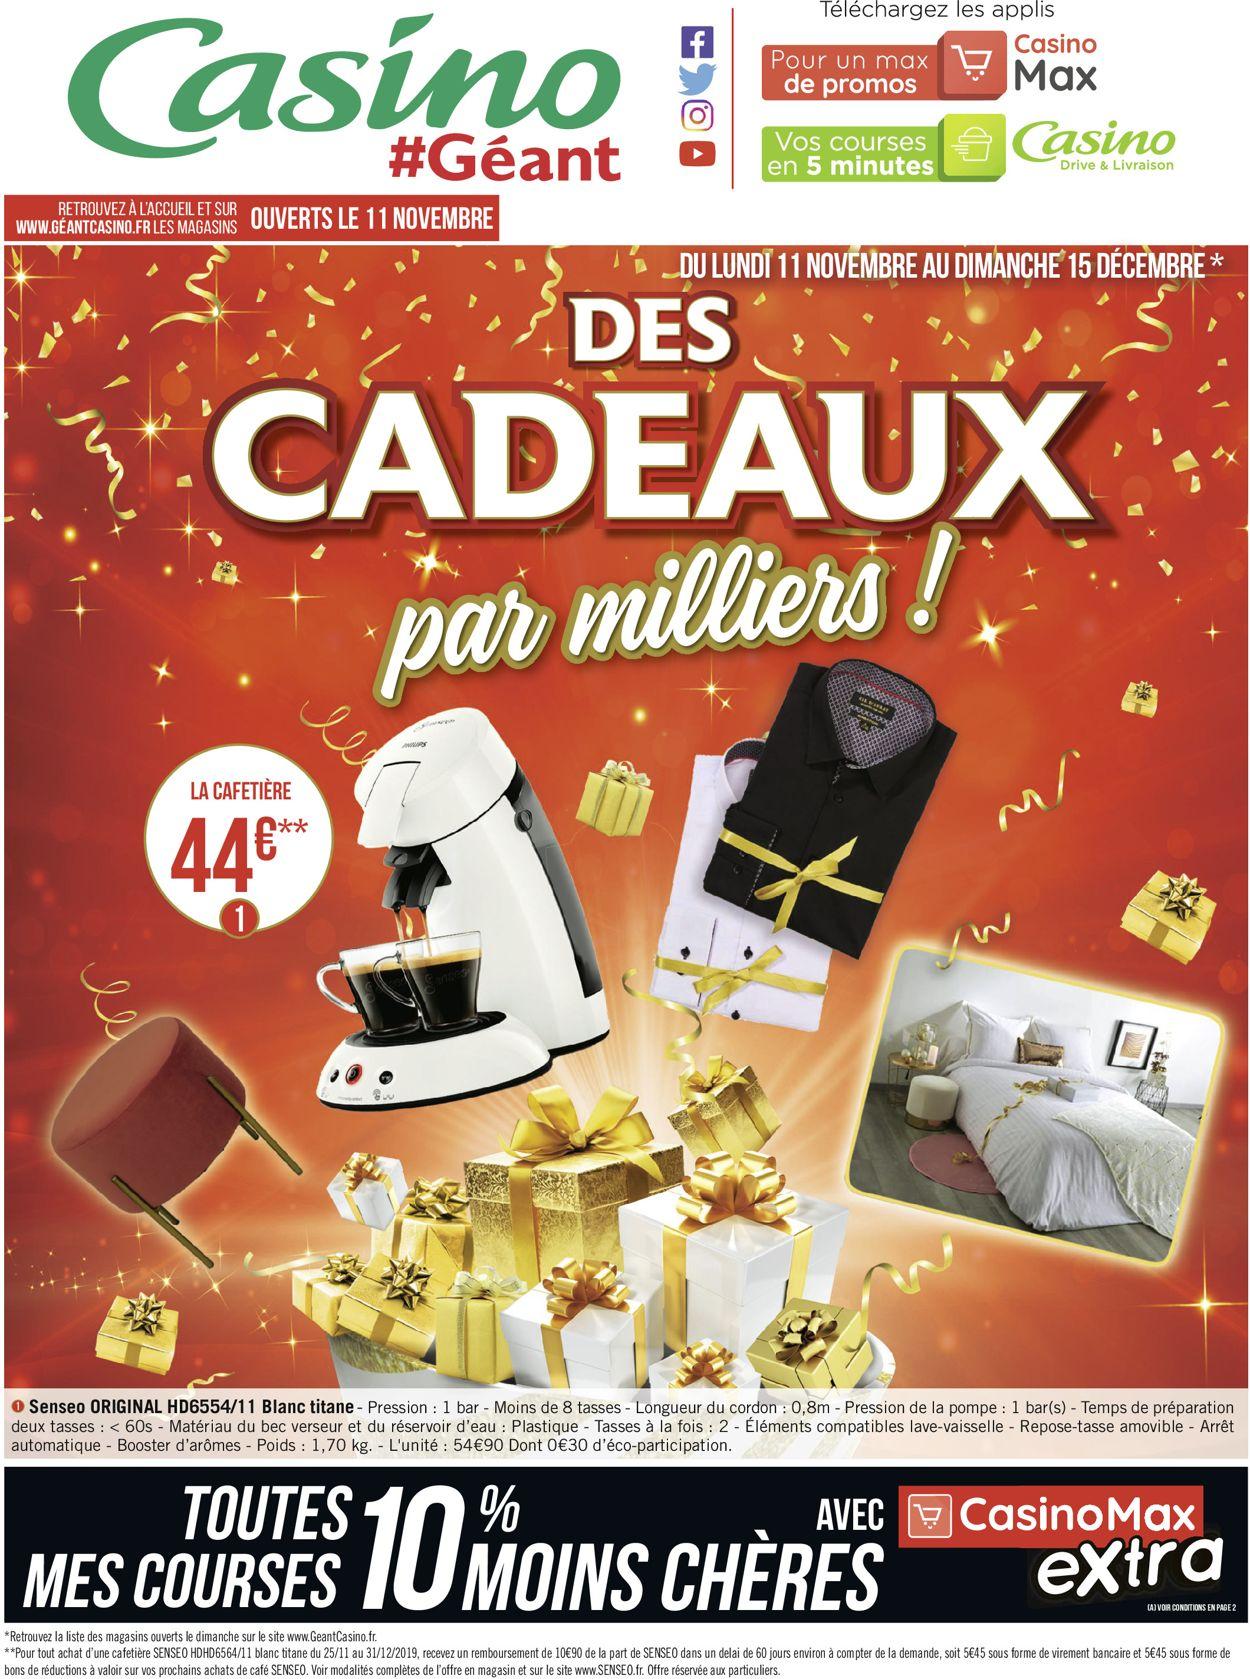 Géant Casino Catalogue - 11.11-15.12.2019